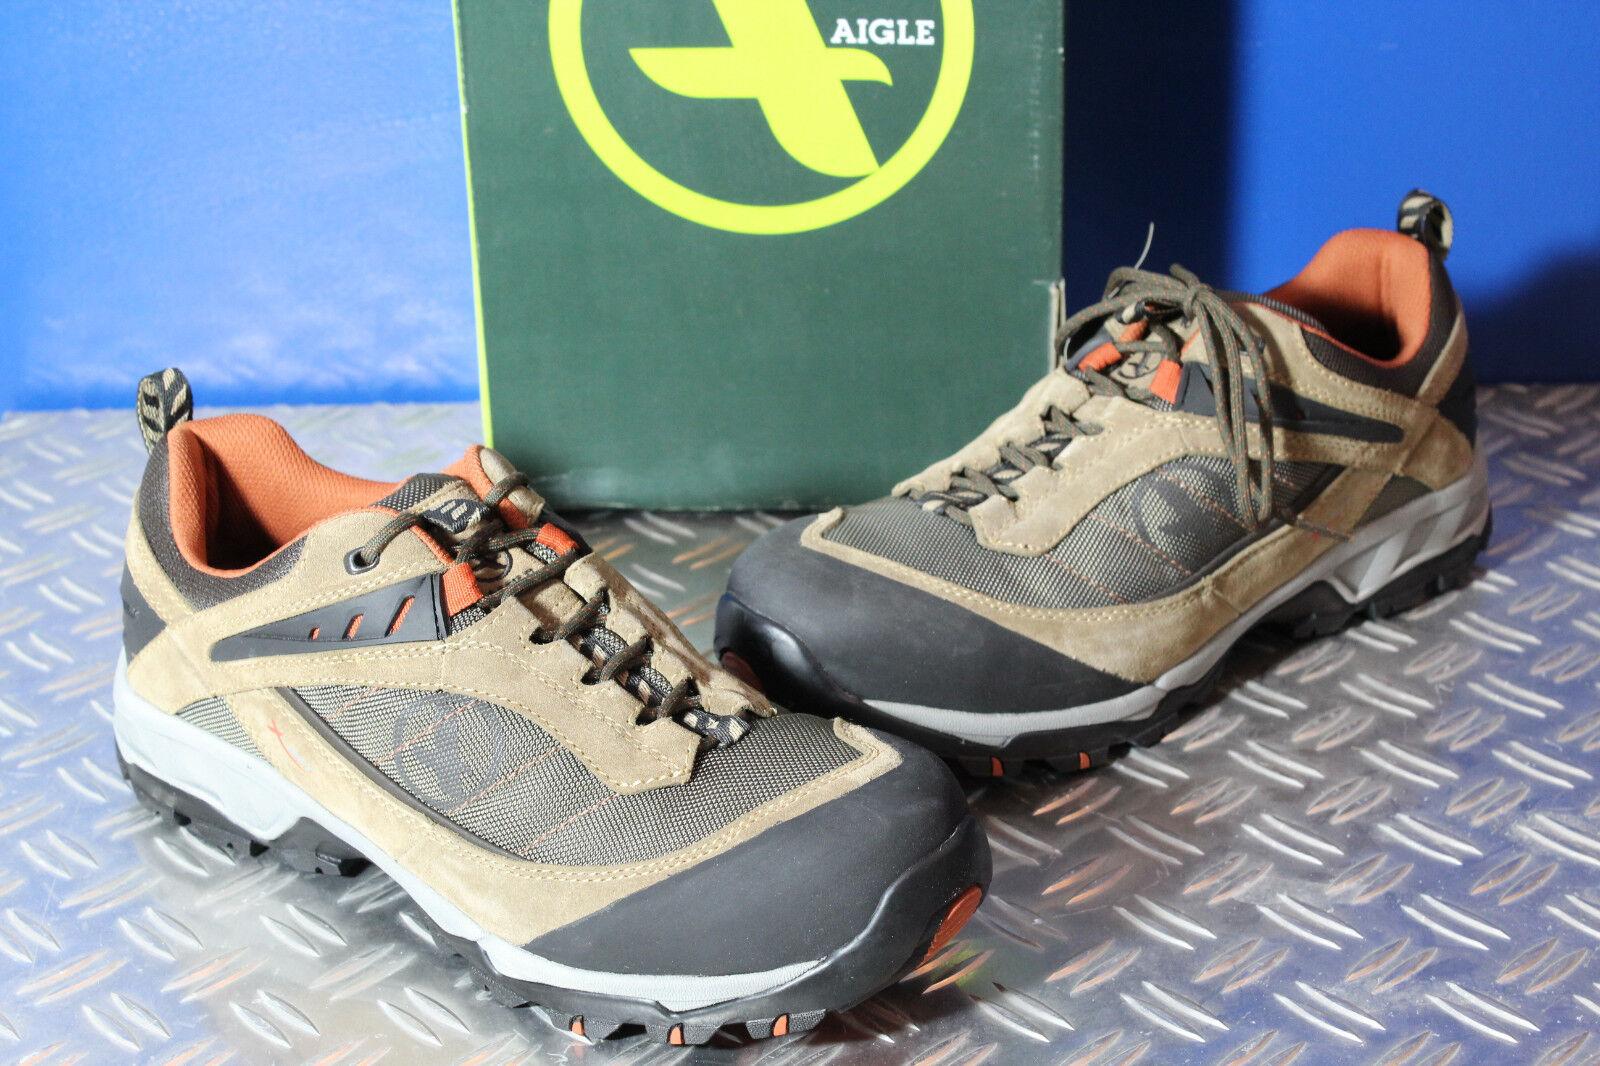 AIGLE Wildleder Outdoor Wanderschuhe Trekking Schuhe Stiefel Wildleder AIGLE Textil terra braun 45 b41ca2